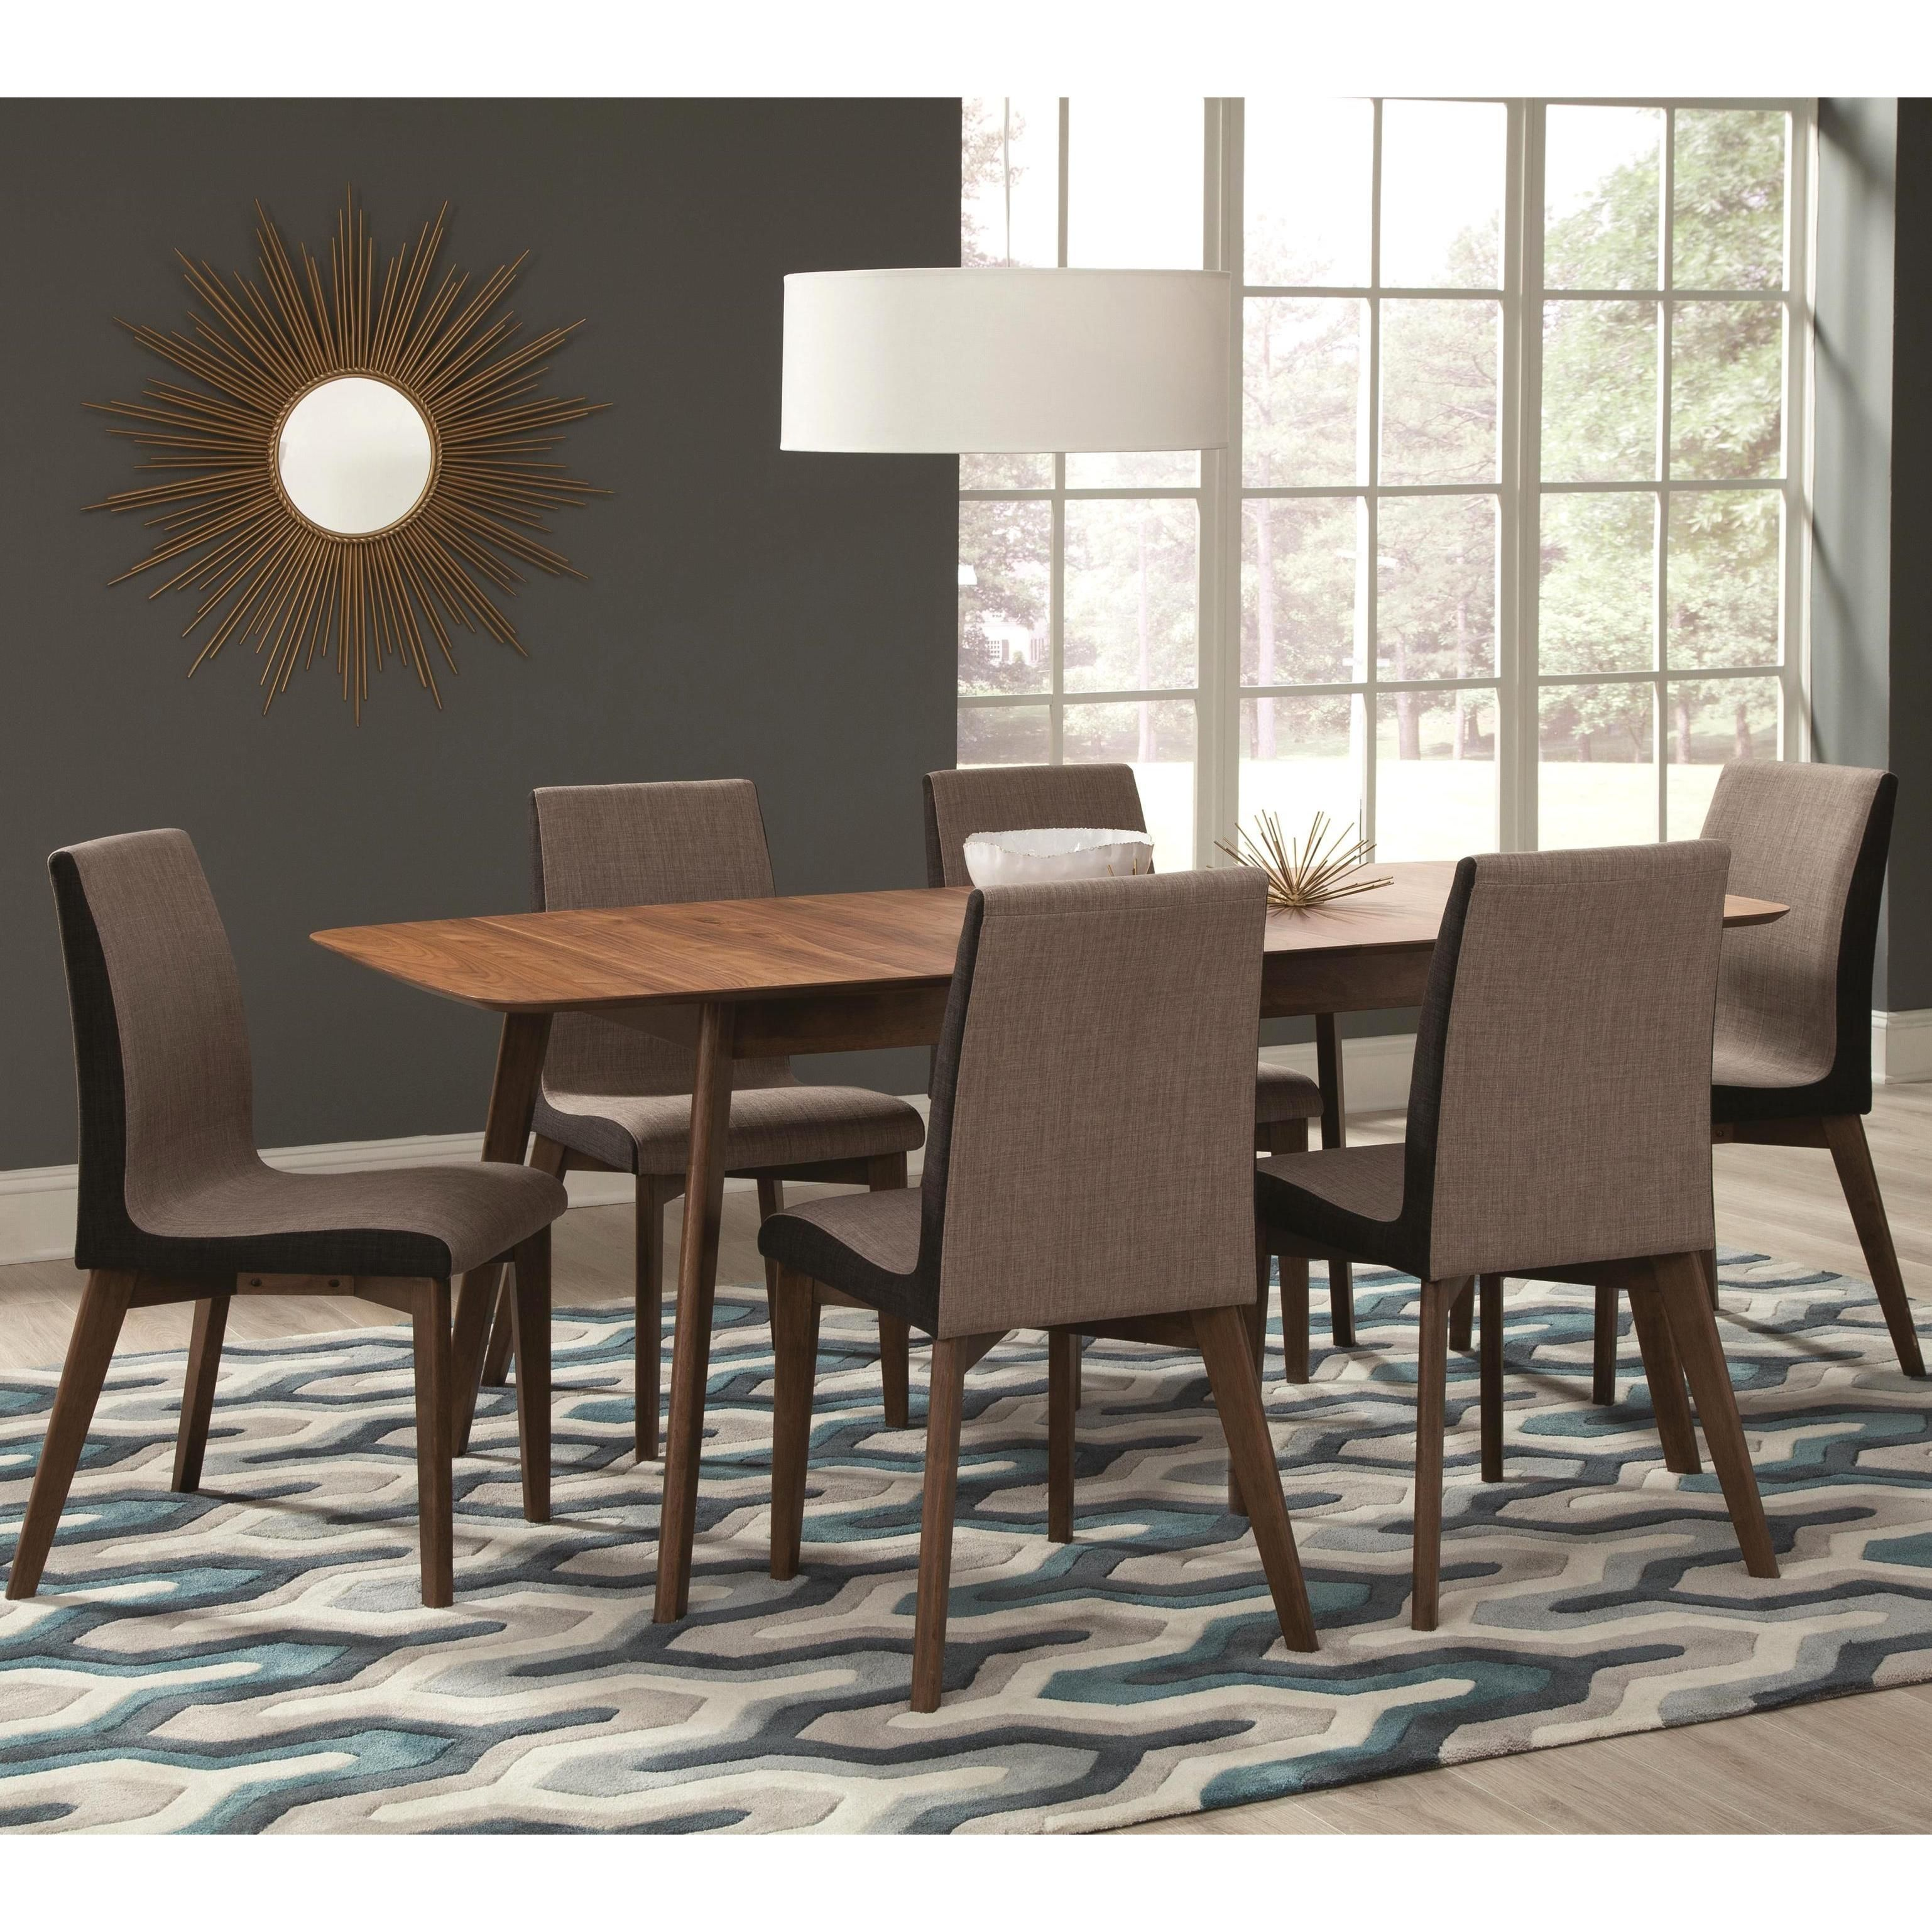 Midcentury Modern Design Nostalgic Dining Set Walnut